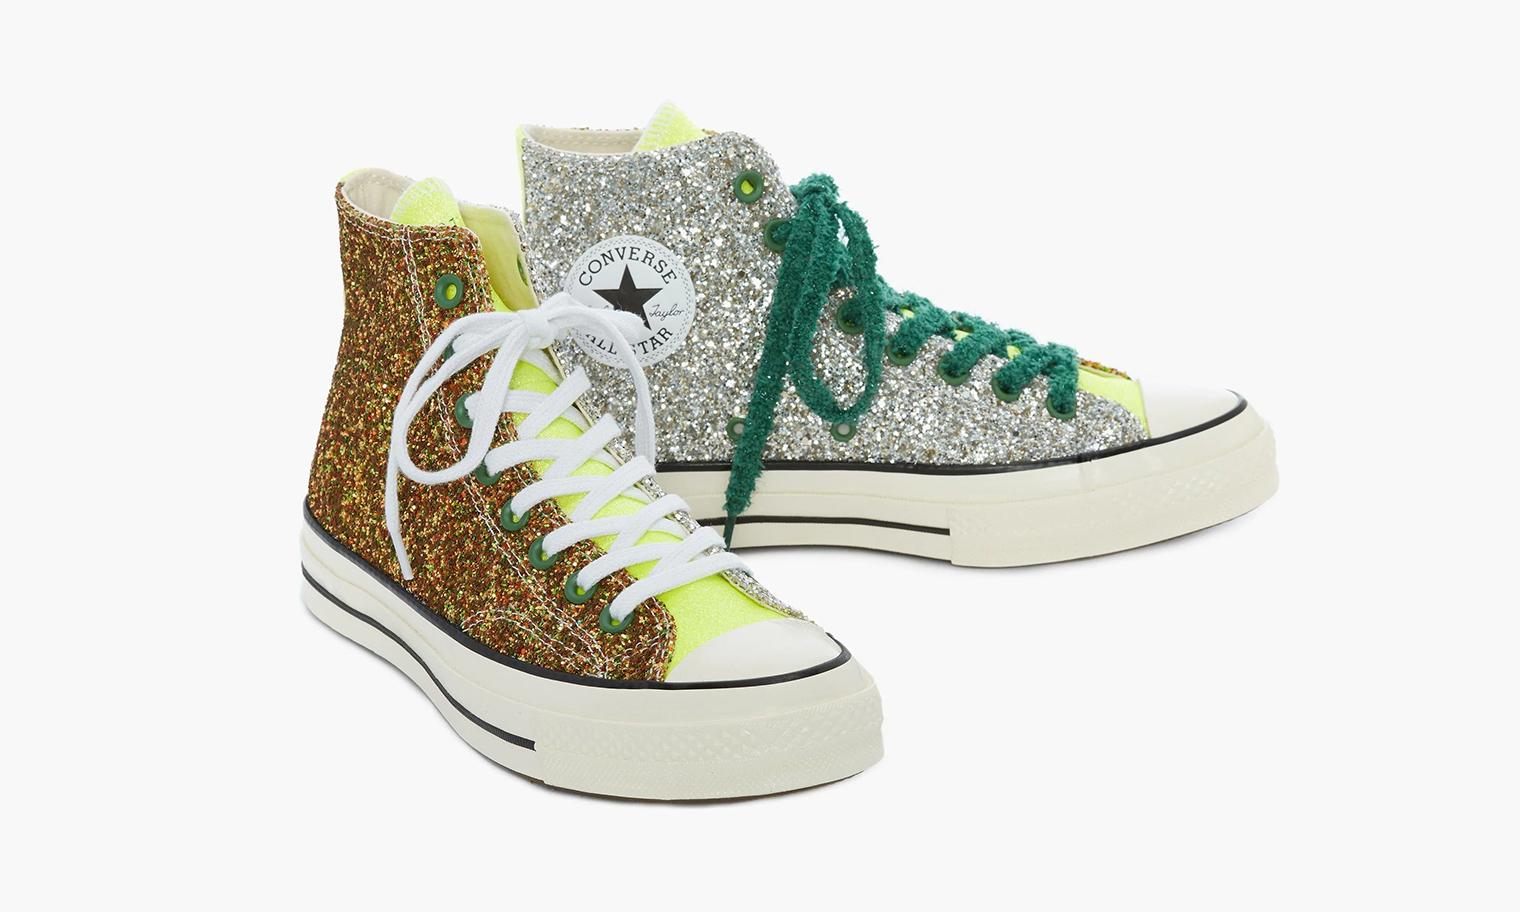 JW Anderson x Converse「Glitter Chuck Taylor」联名球鞋即将开启抽签发售